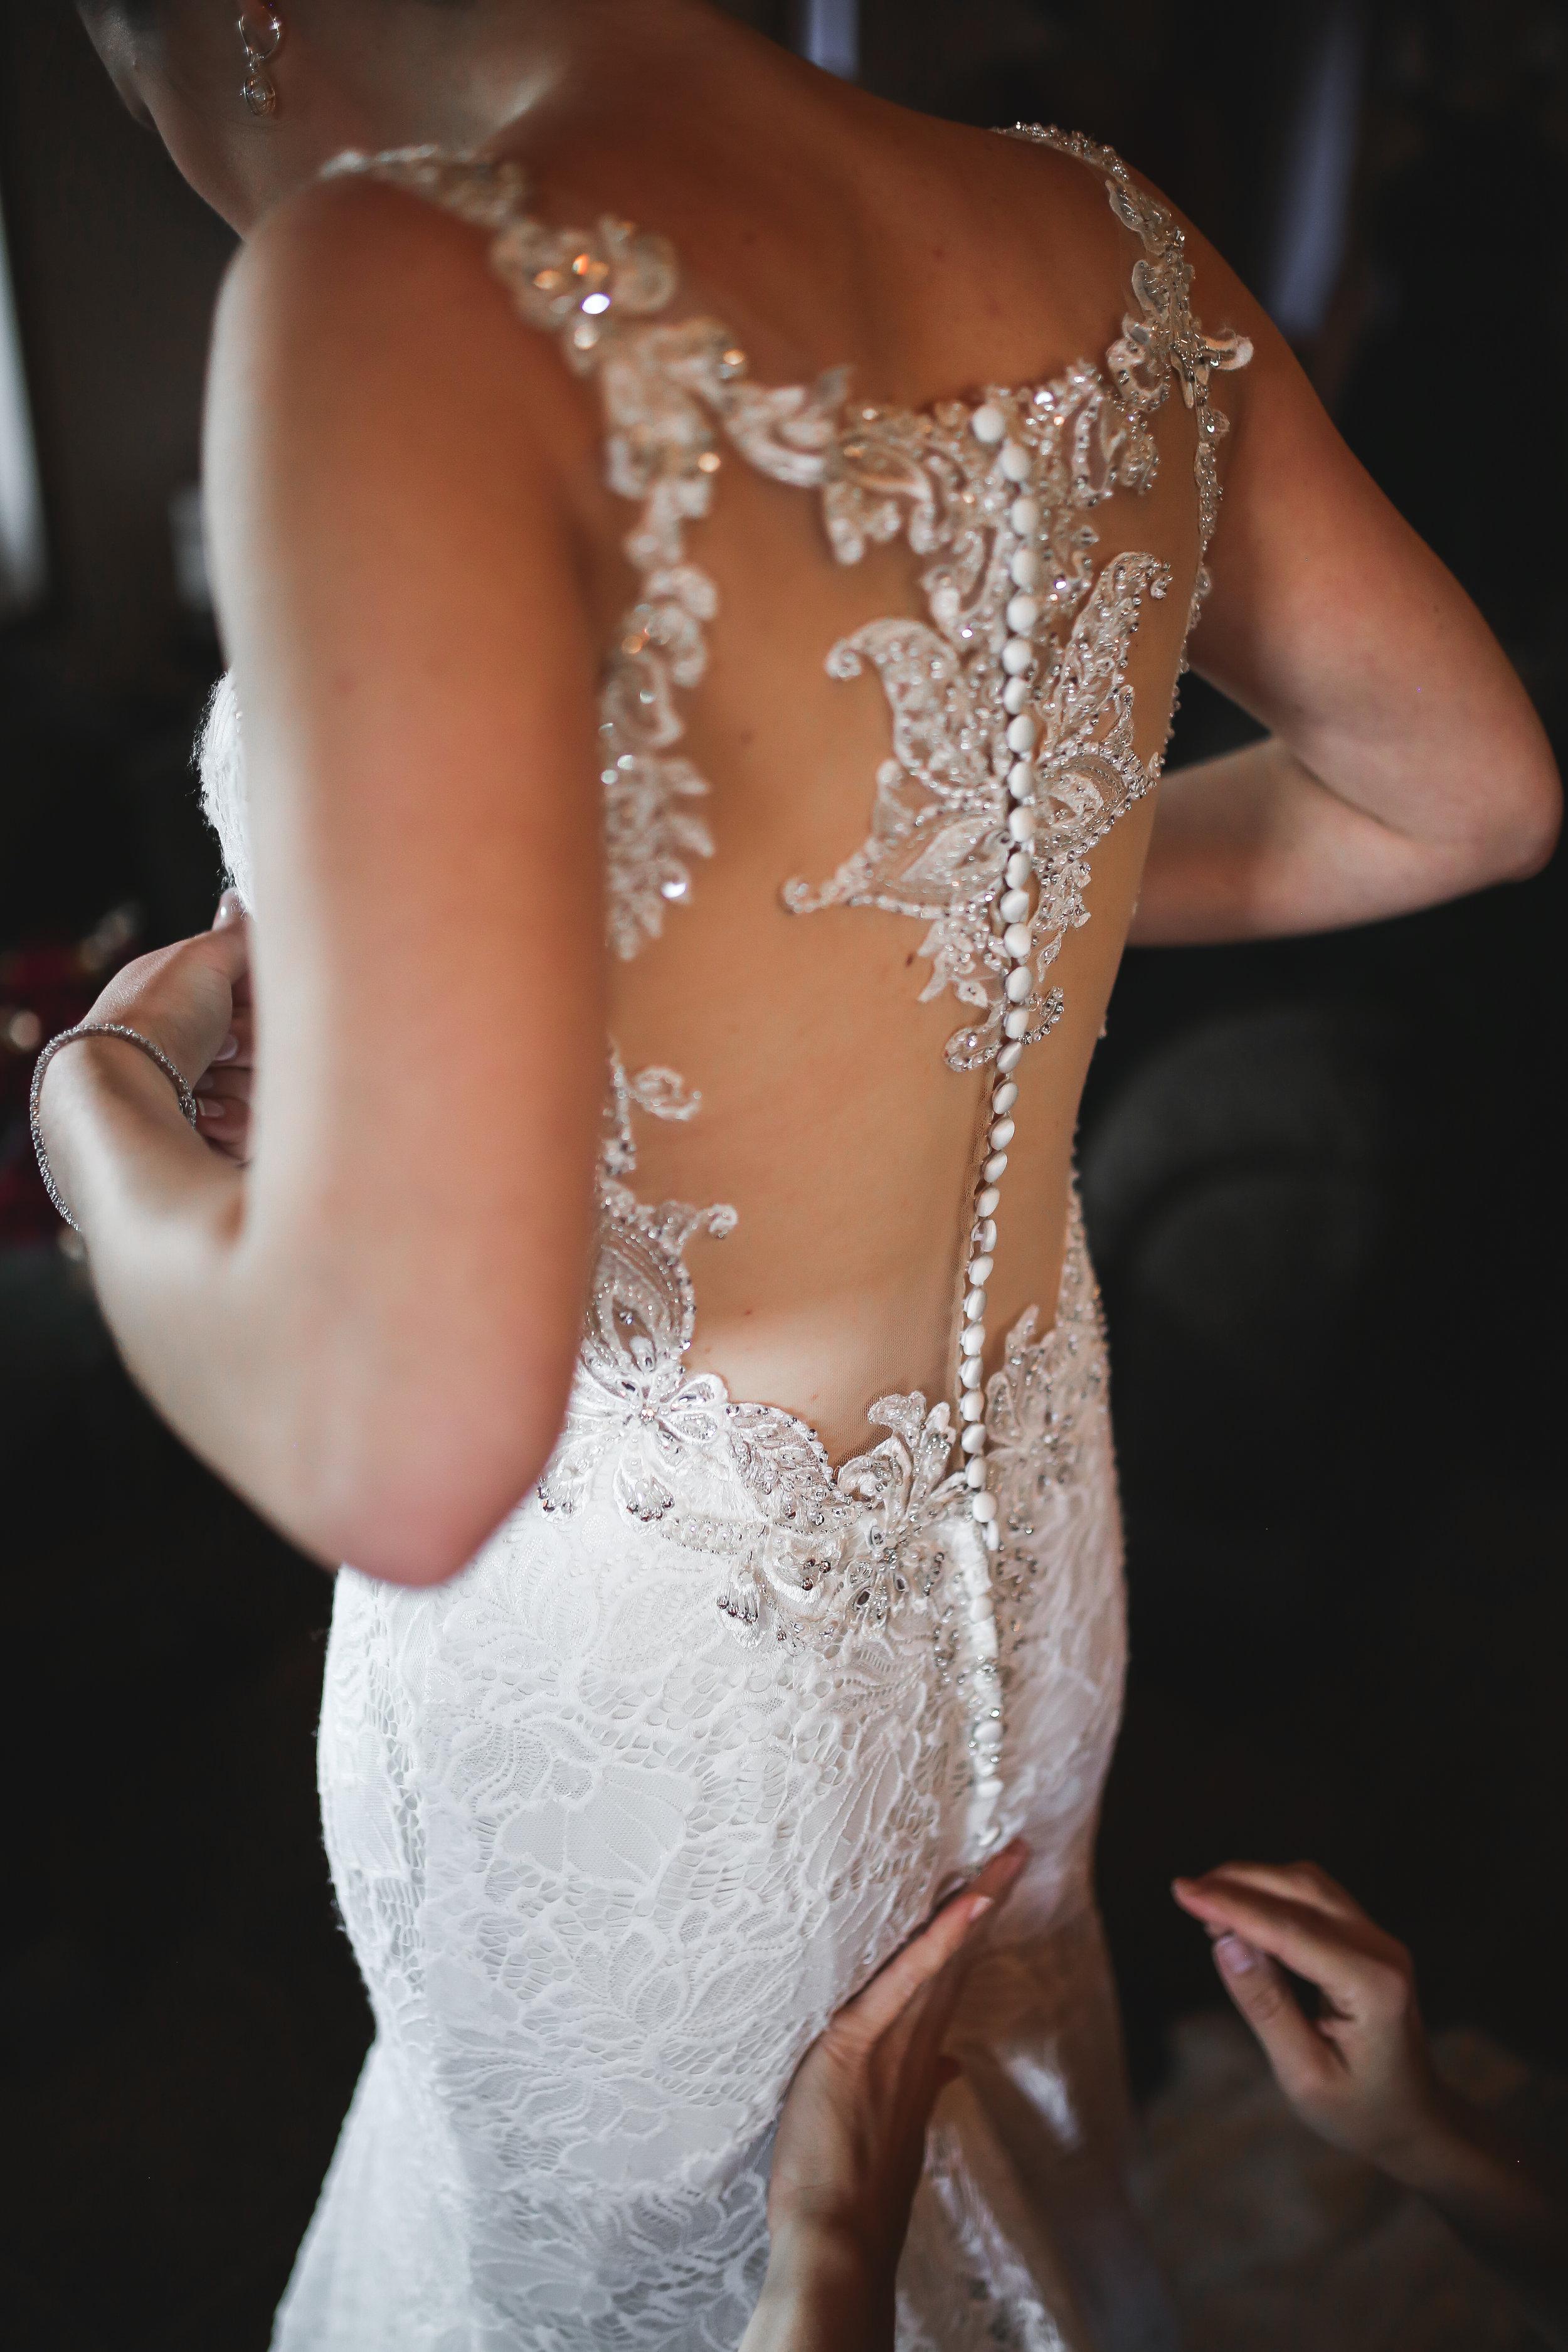 127 Adam Ziorio Photography - Vitoria wedding photographer Nick&Bree Fernie Wedding.jpg